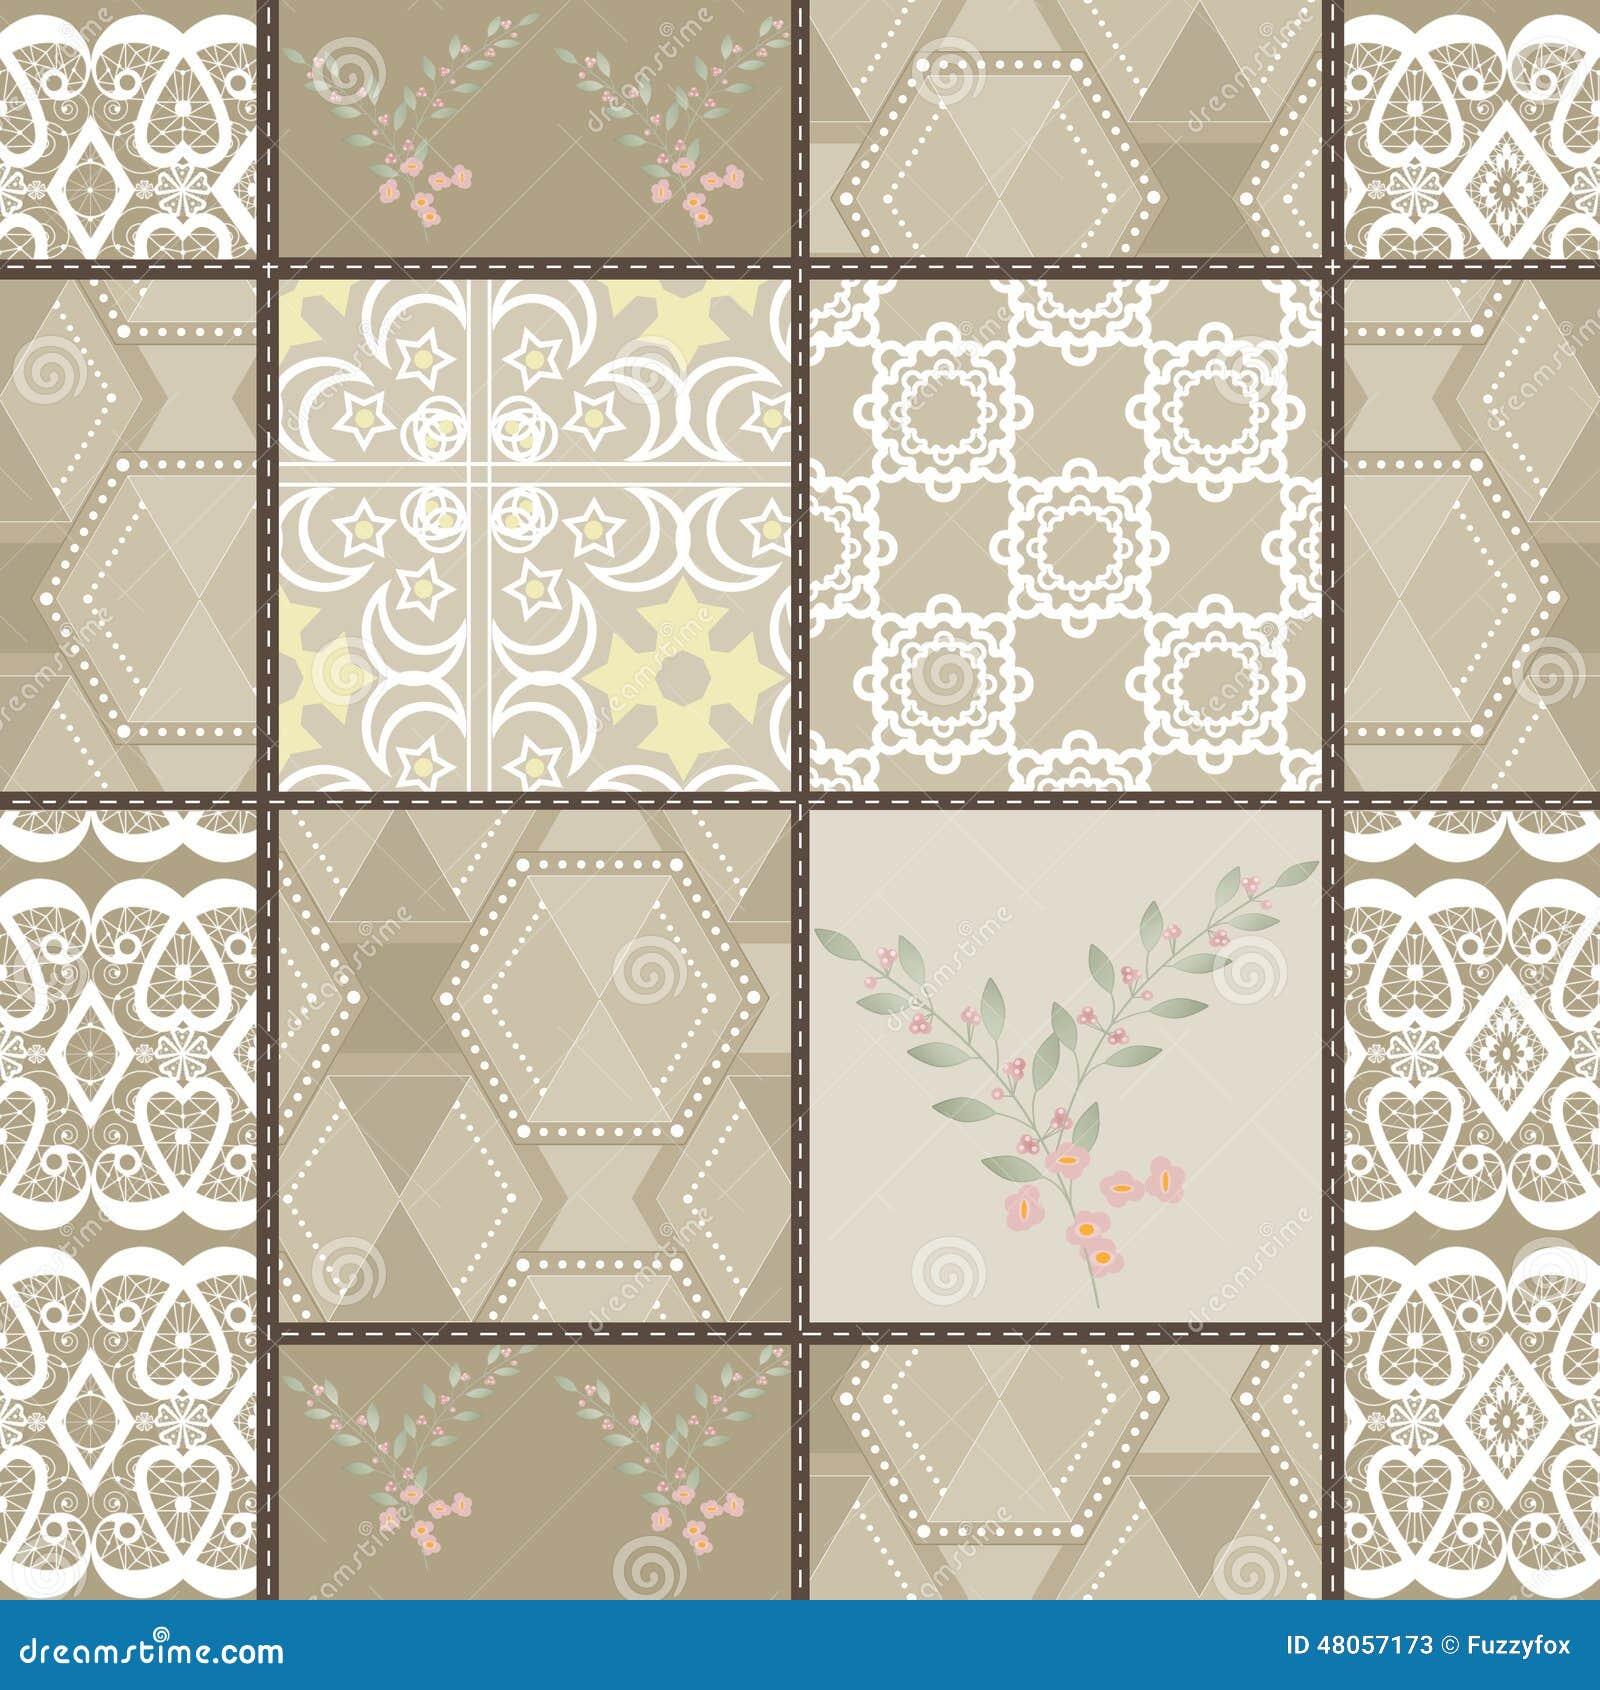 lace background tile - photo #47